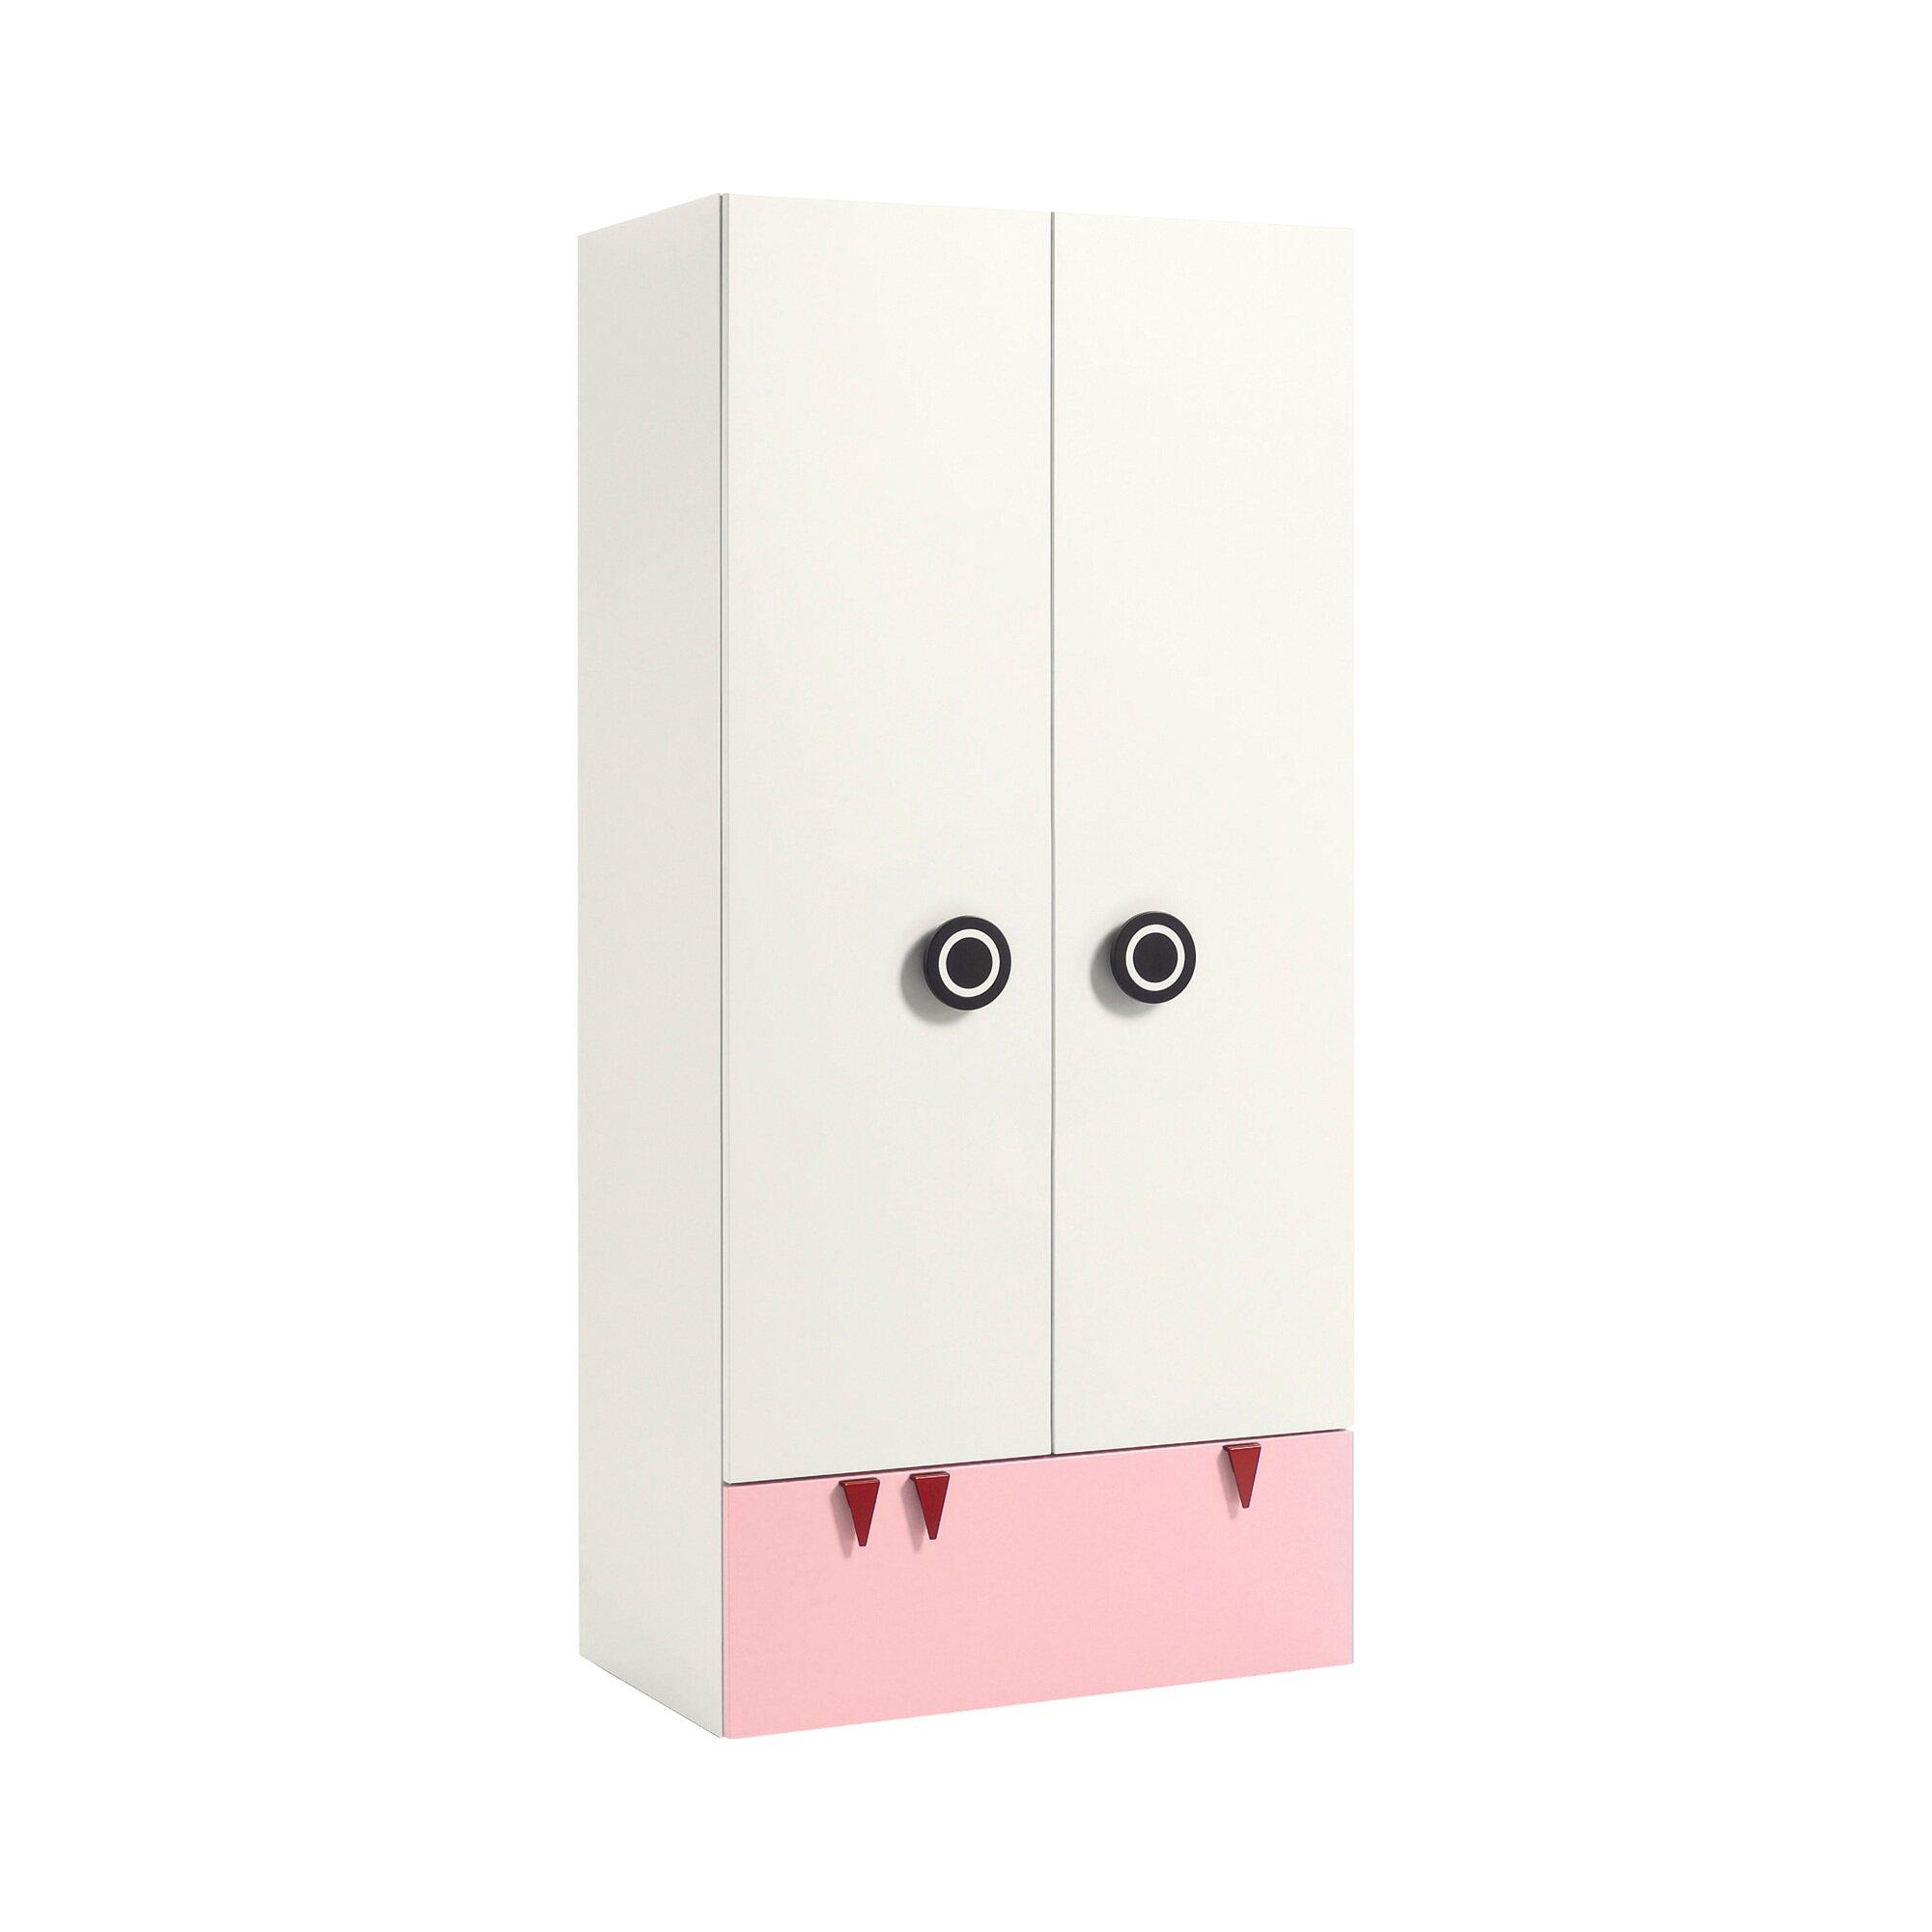 Now! Minimo Kleiderschrank MINIMO (2 Türen, 1 Schublade)